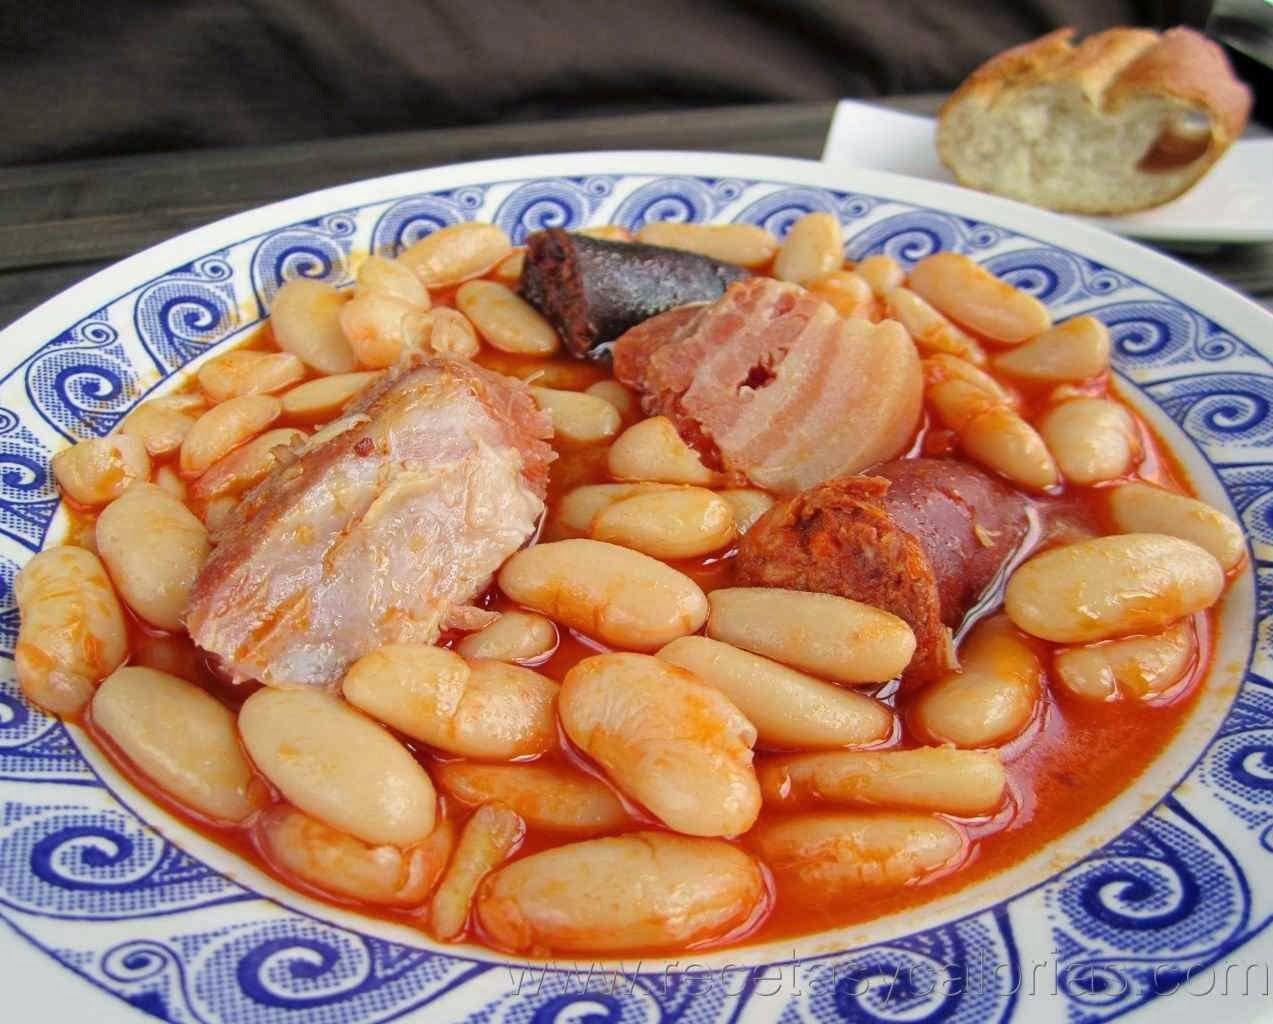 Recetas De Cocina Asturiana Faciles | Fabada Un Clasico De La Cocina Asturiana Por 420 Kcal 100g